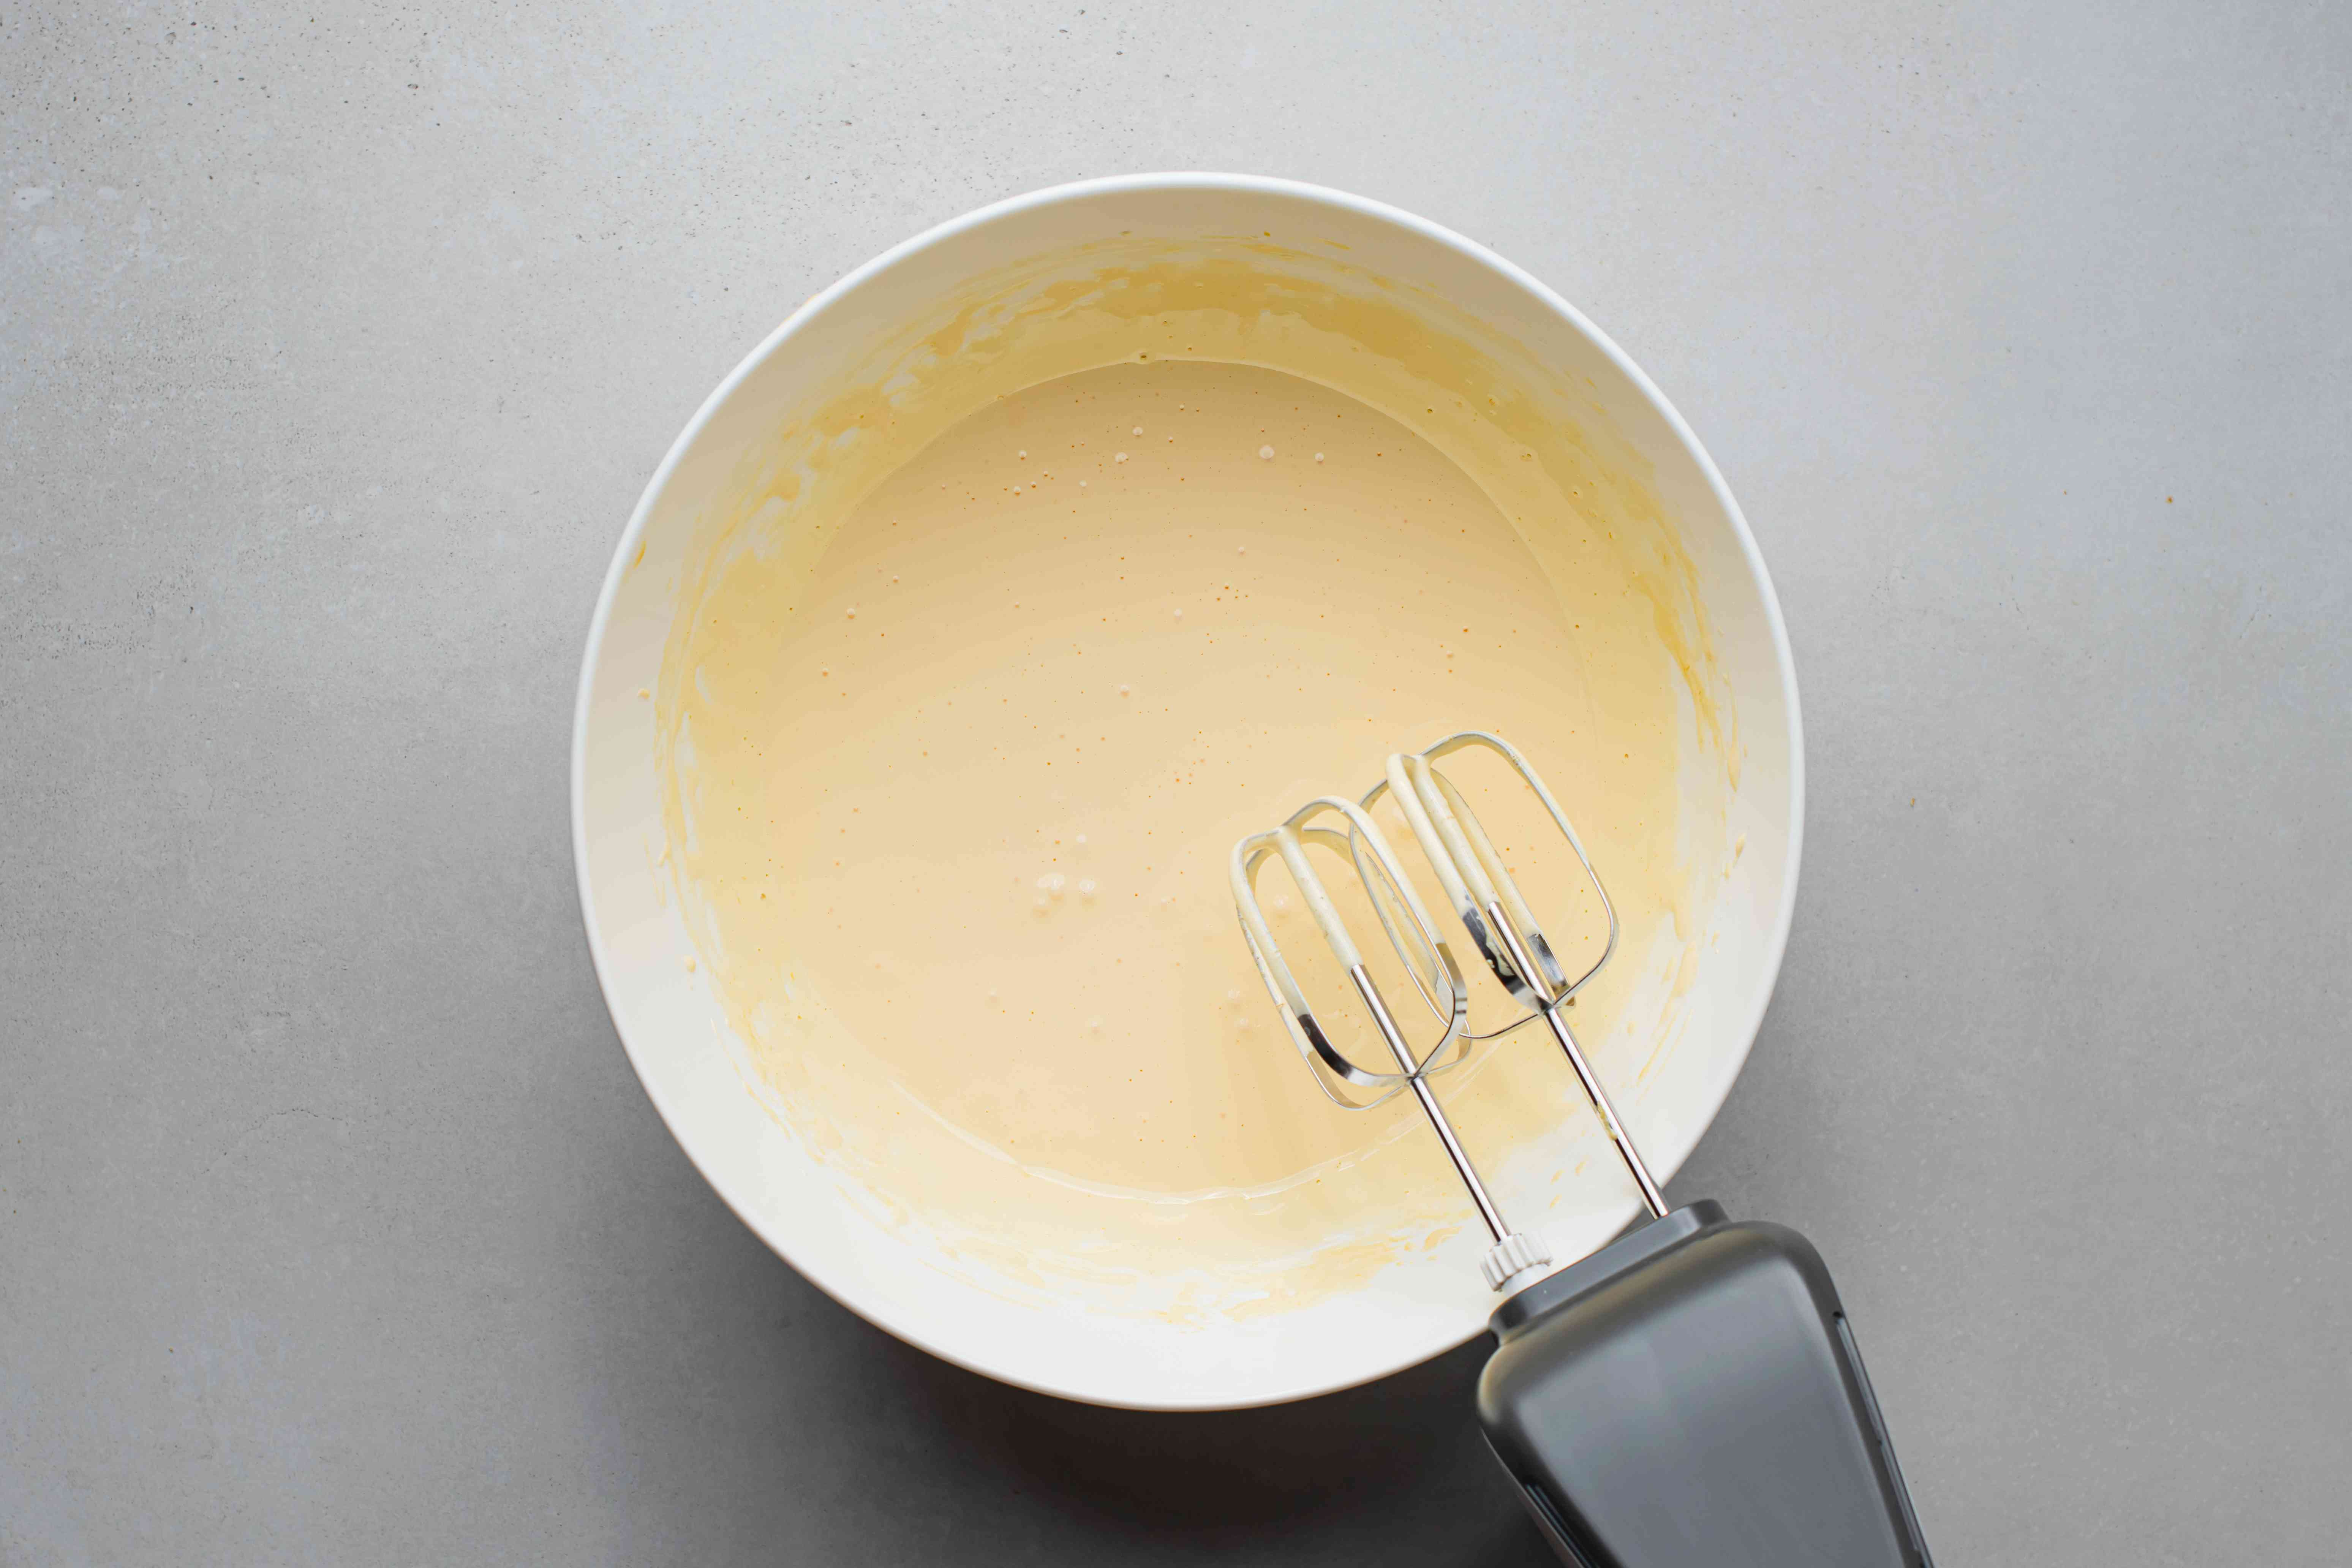 egg yolks and sugar beat together